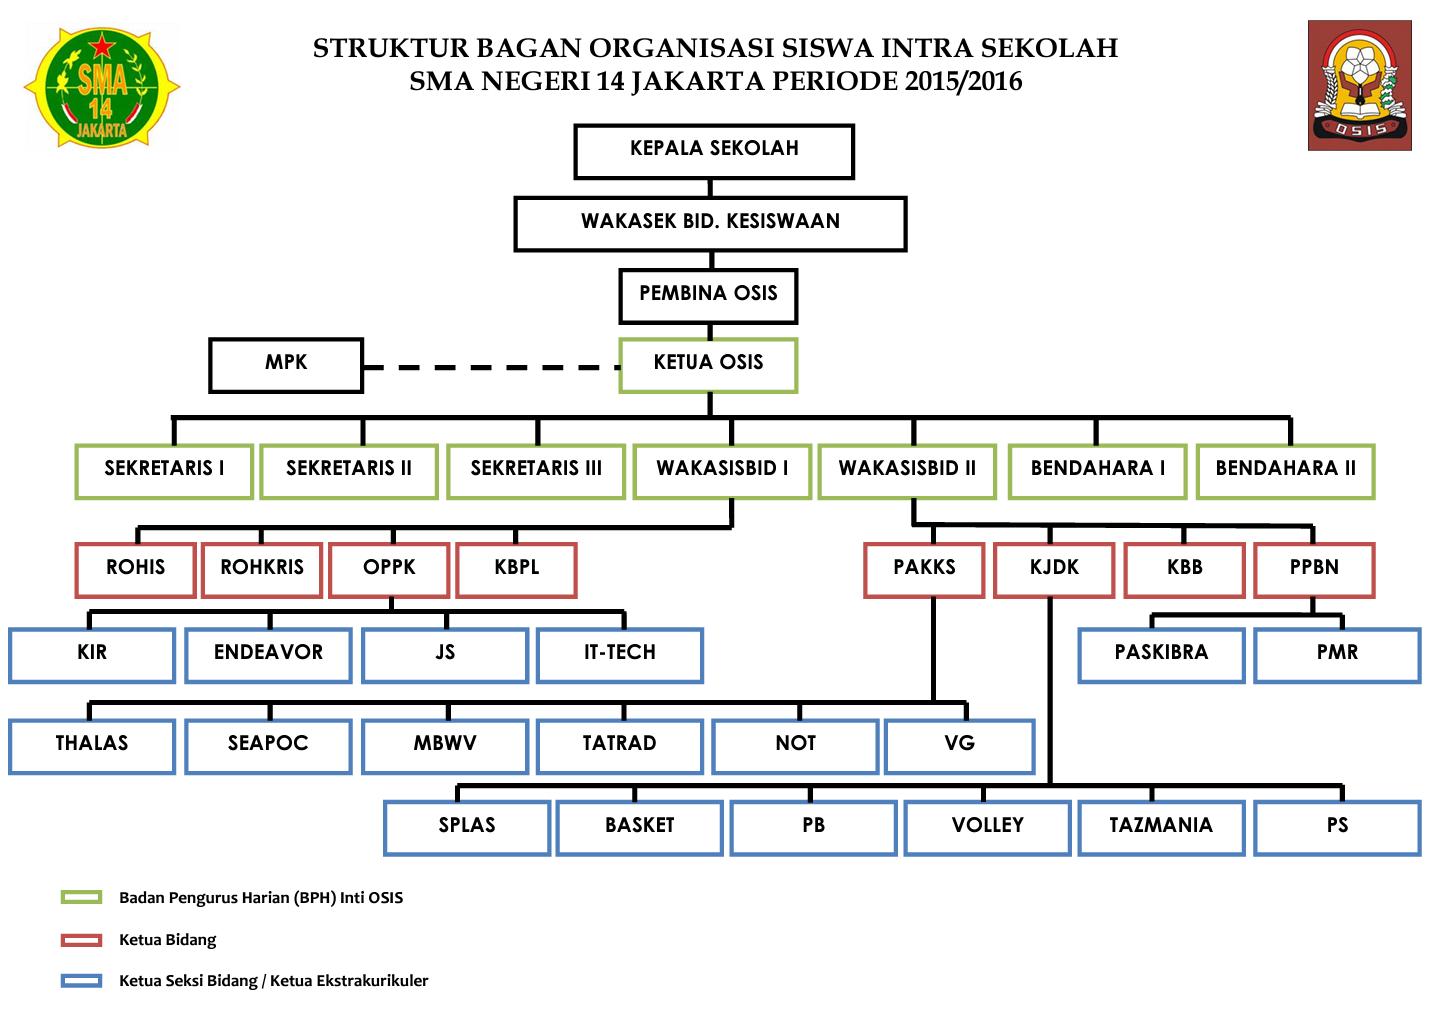 berkas struktur bagan osis sma negeri 14 jakarta (resmi) png Bagan Struktur Di Industri berkas struktur bagan osis sma negeri 14 jakarta (resmi) png